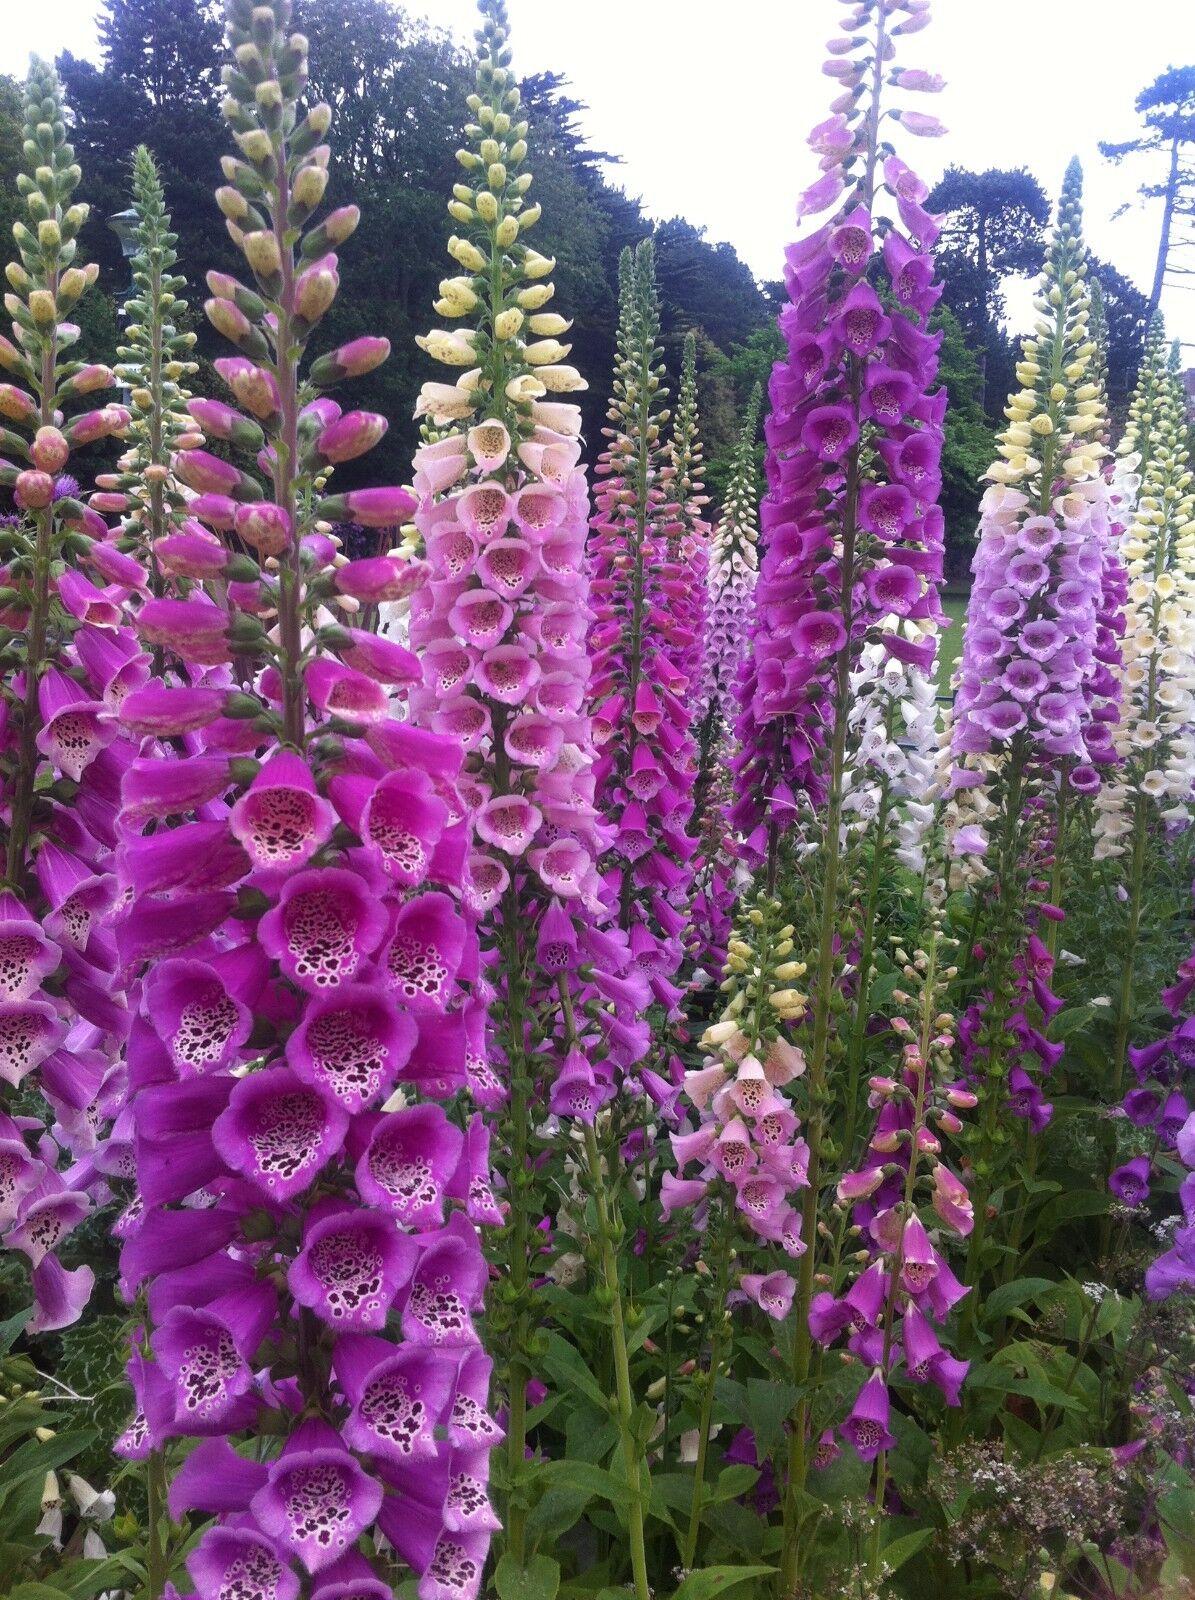 DIGITALIS PURPUREA FOXGLOVE MIXED COLOURS 13,000 SEEDS PERENNIAL FLOWER